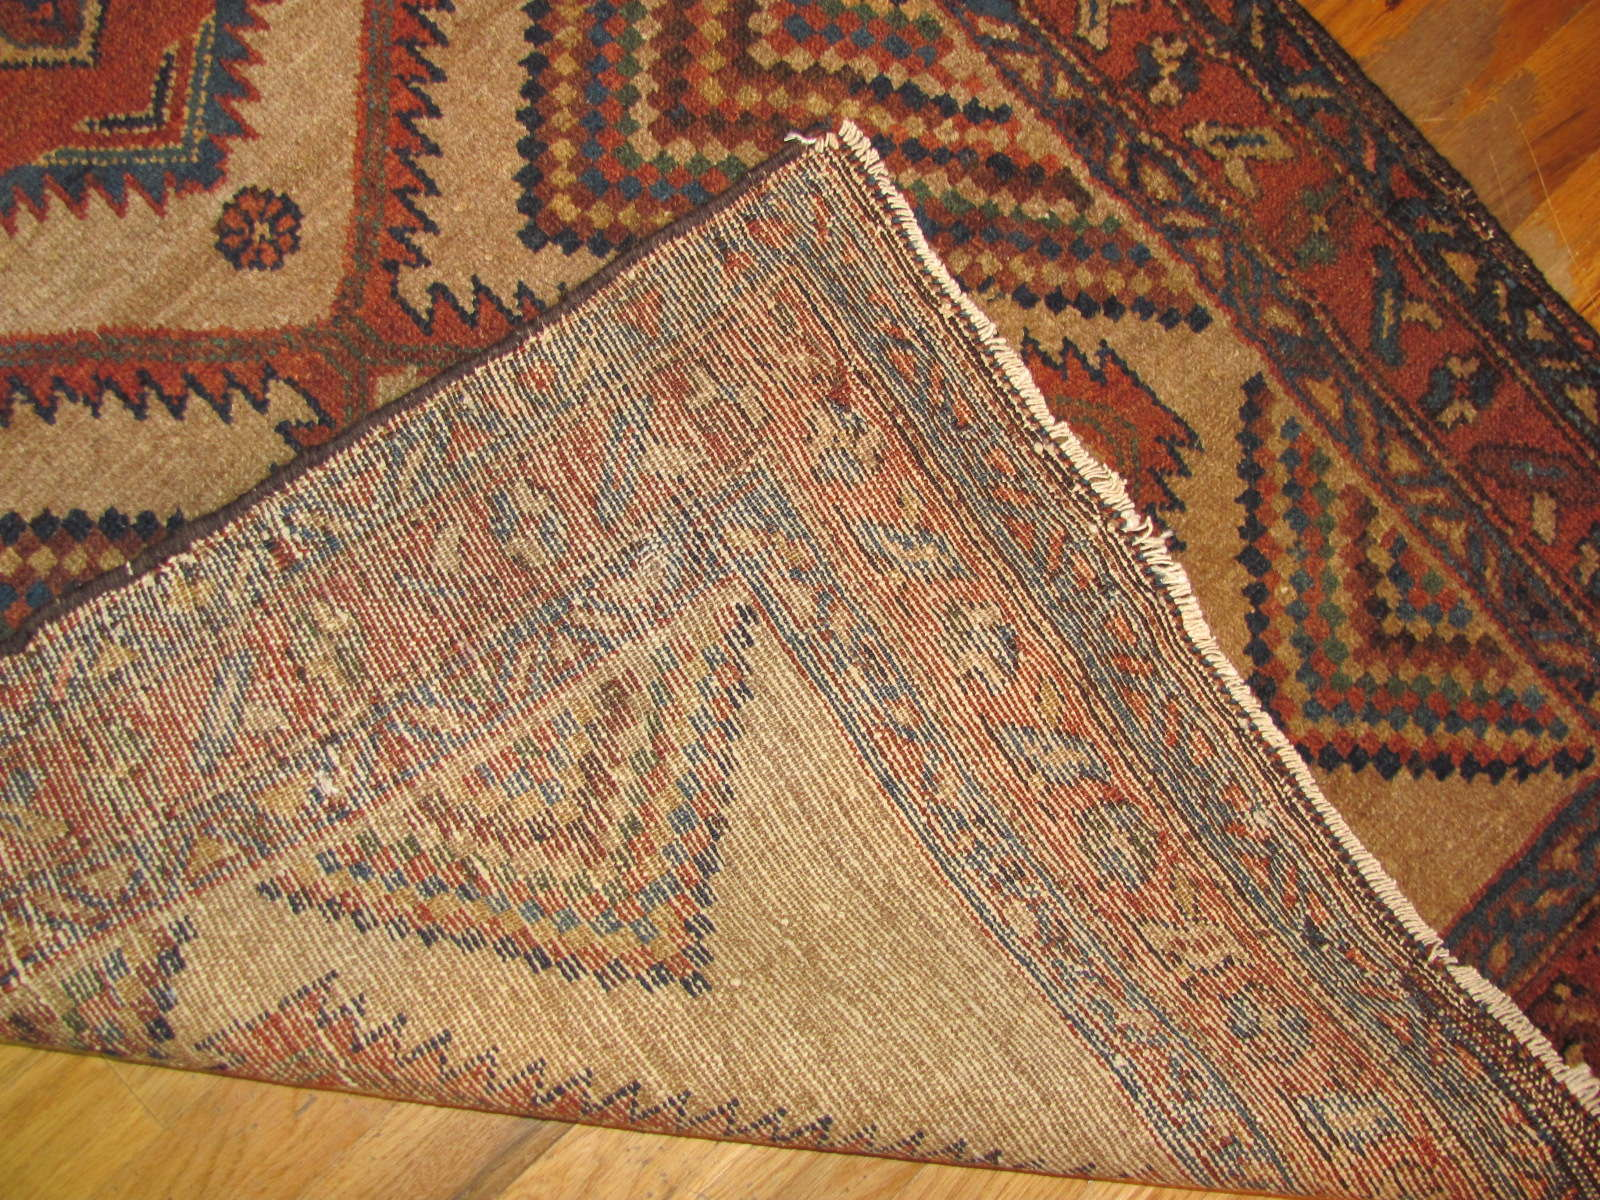 24633 antique persian hamadan rug 3 x 5,1 -2